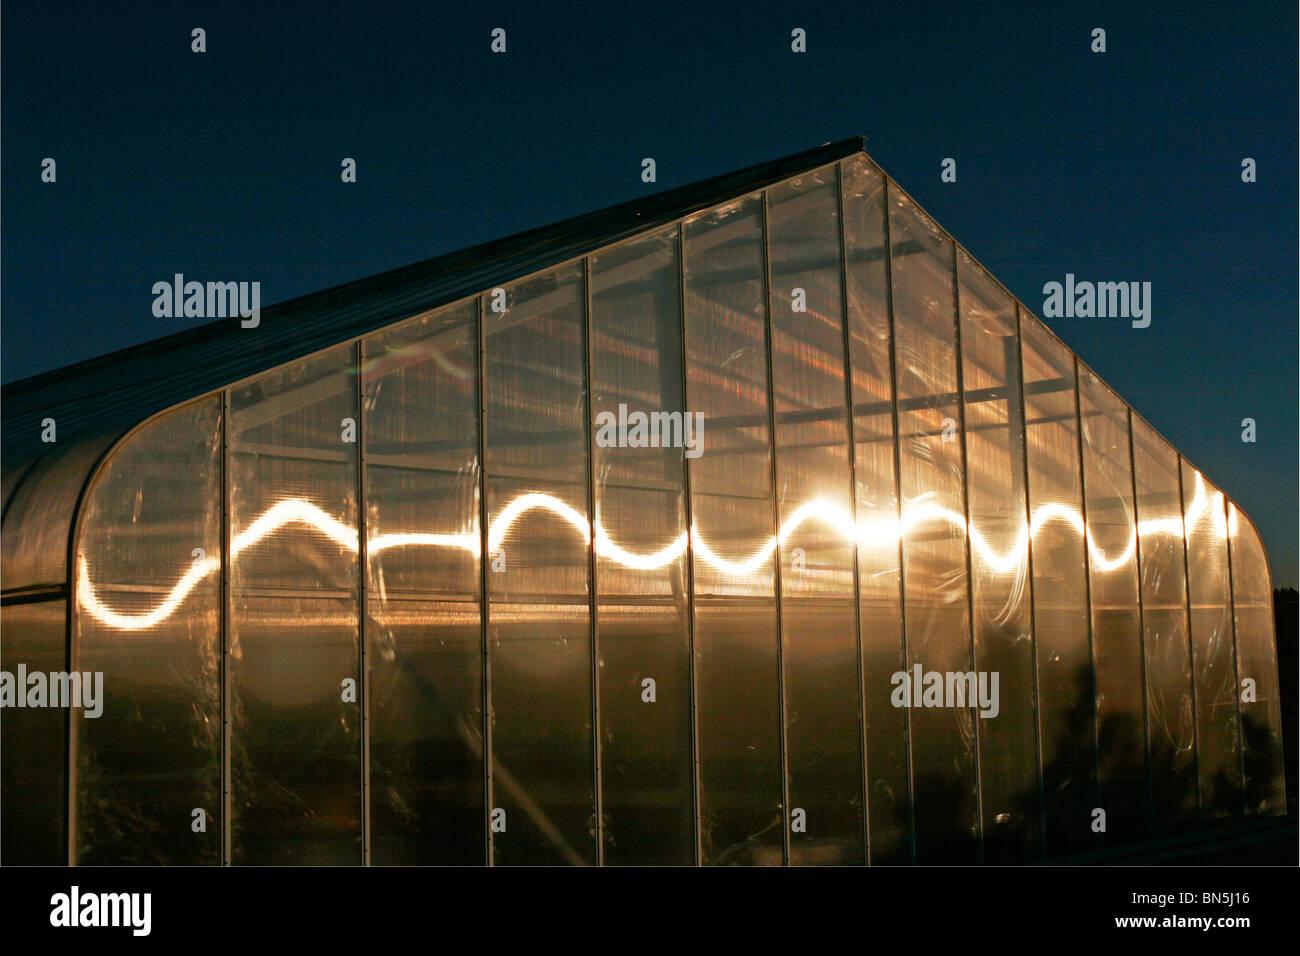 Serre jardin avec réflexion swirl Photo Stock